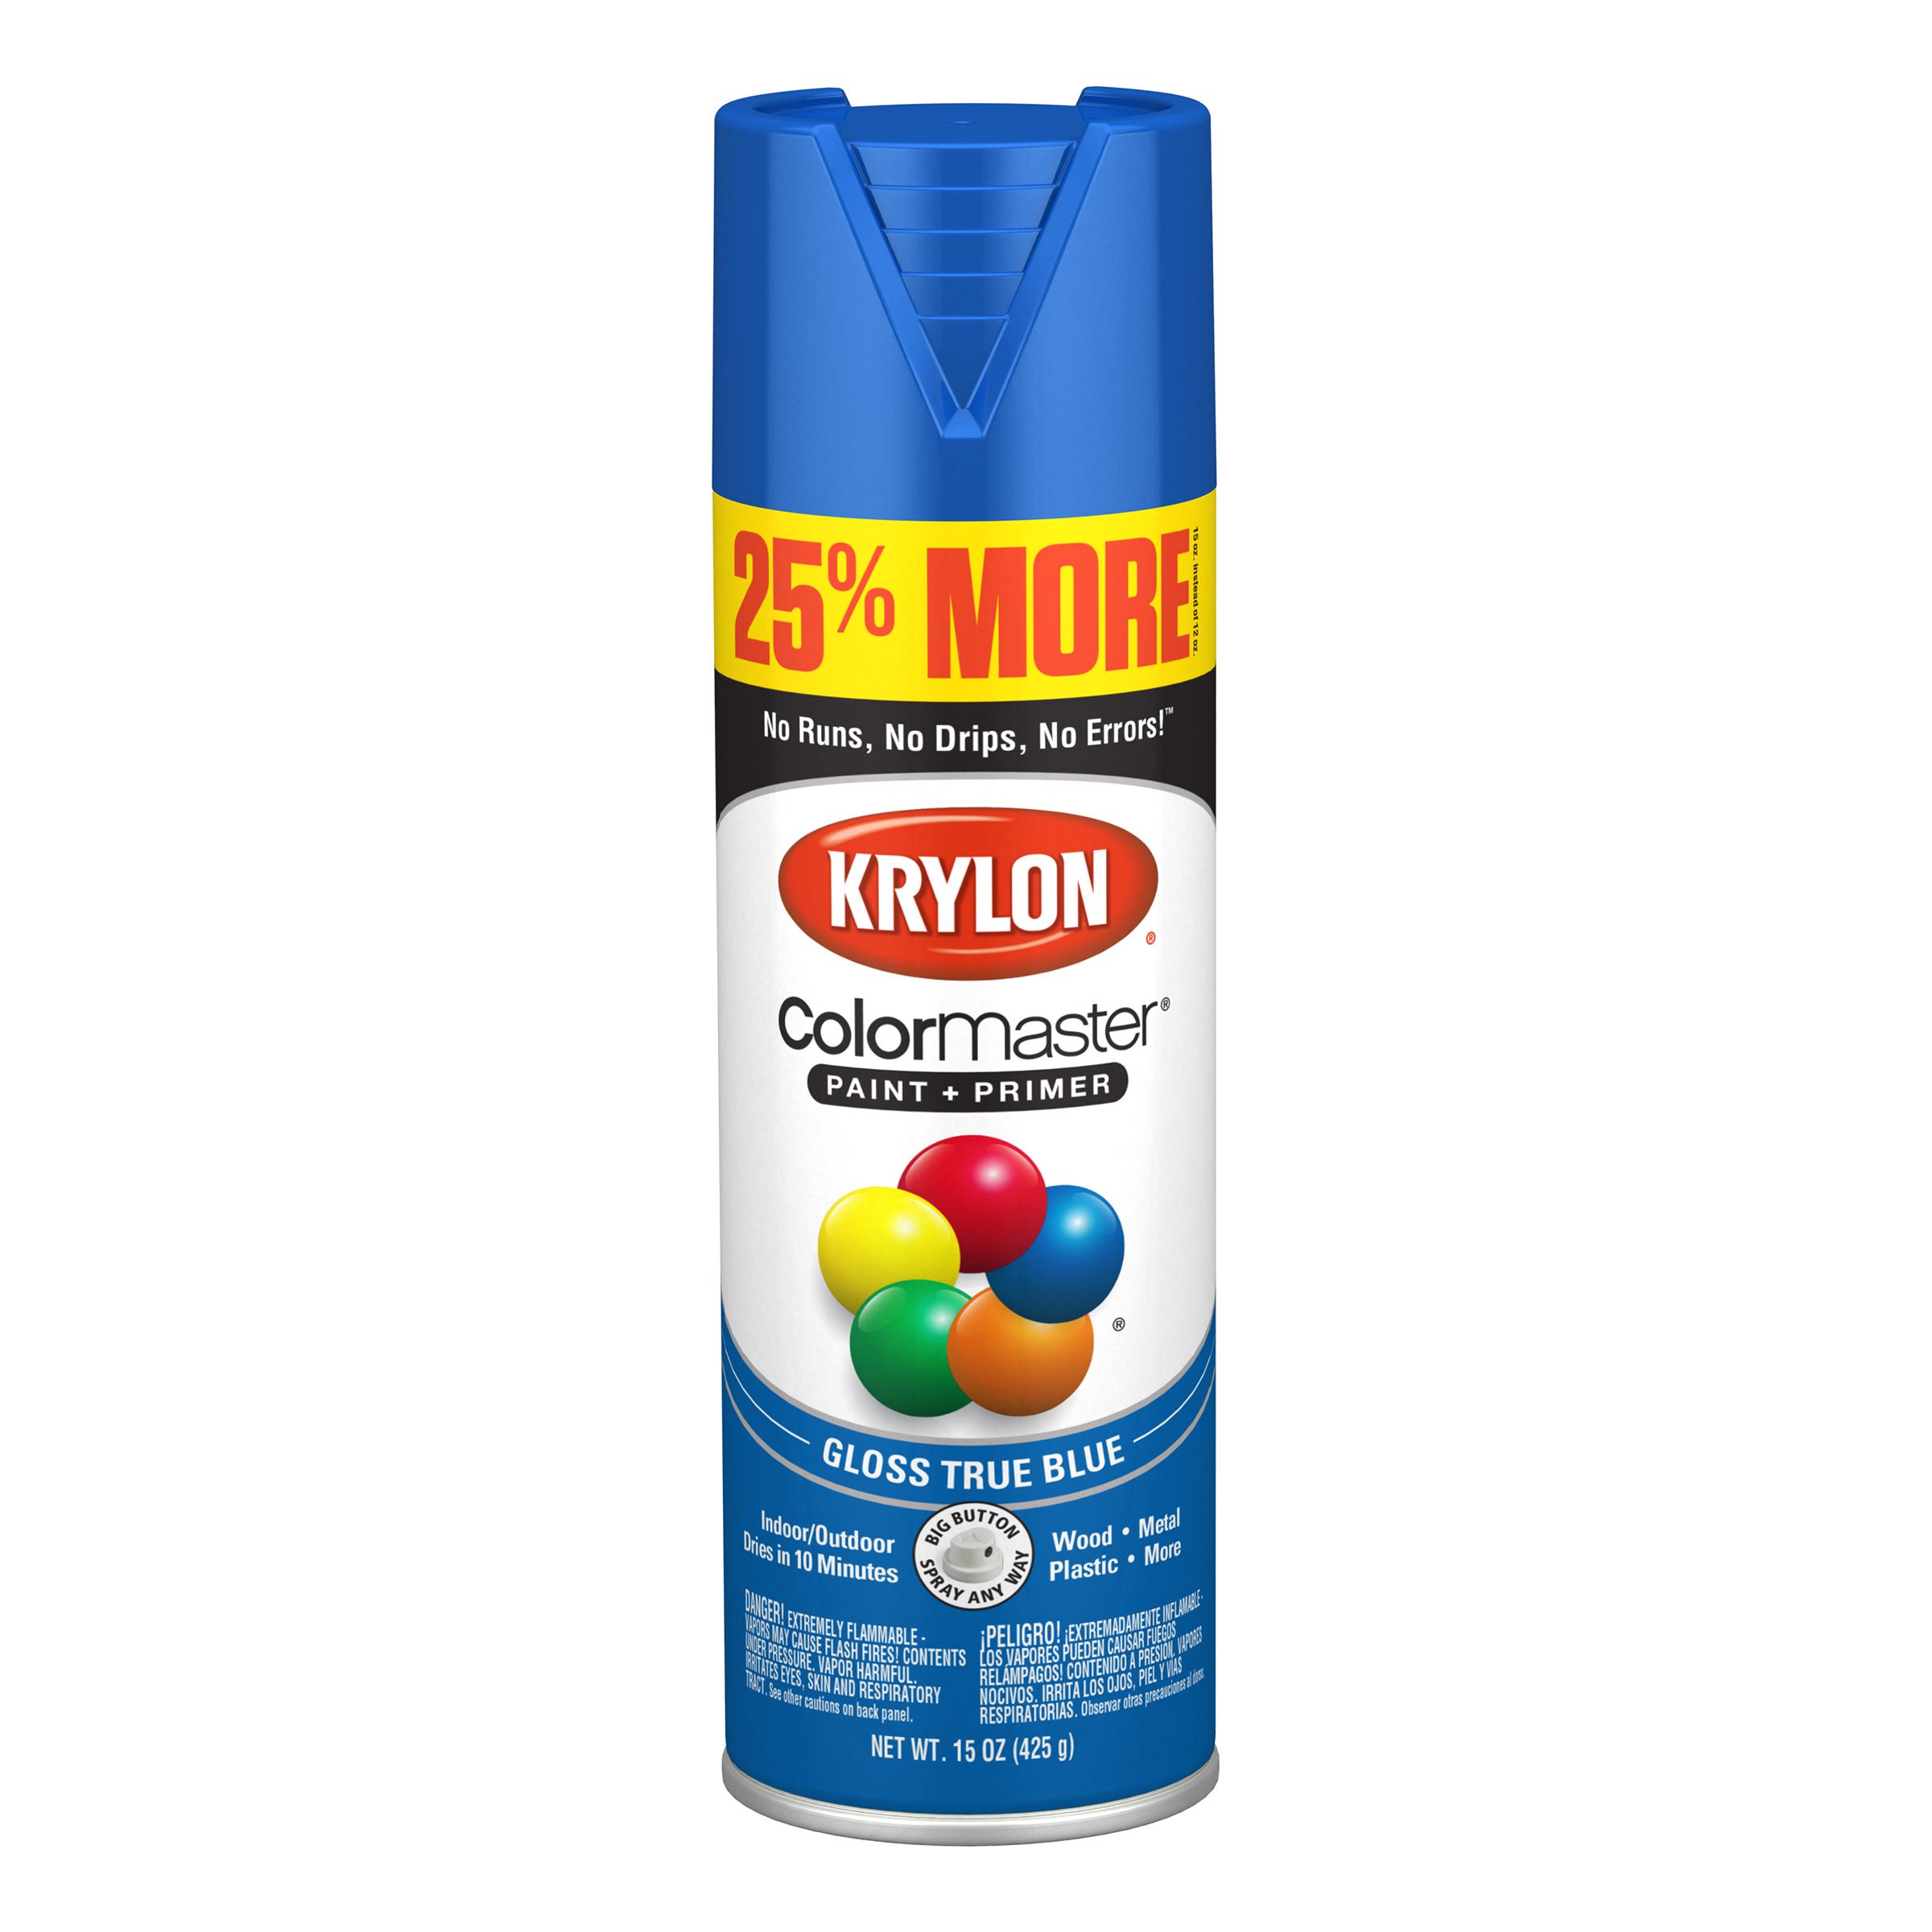 Krylon® ColorMaster Paint + Primer Gloss True Blue, 15-Oz